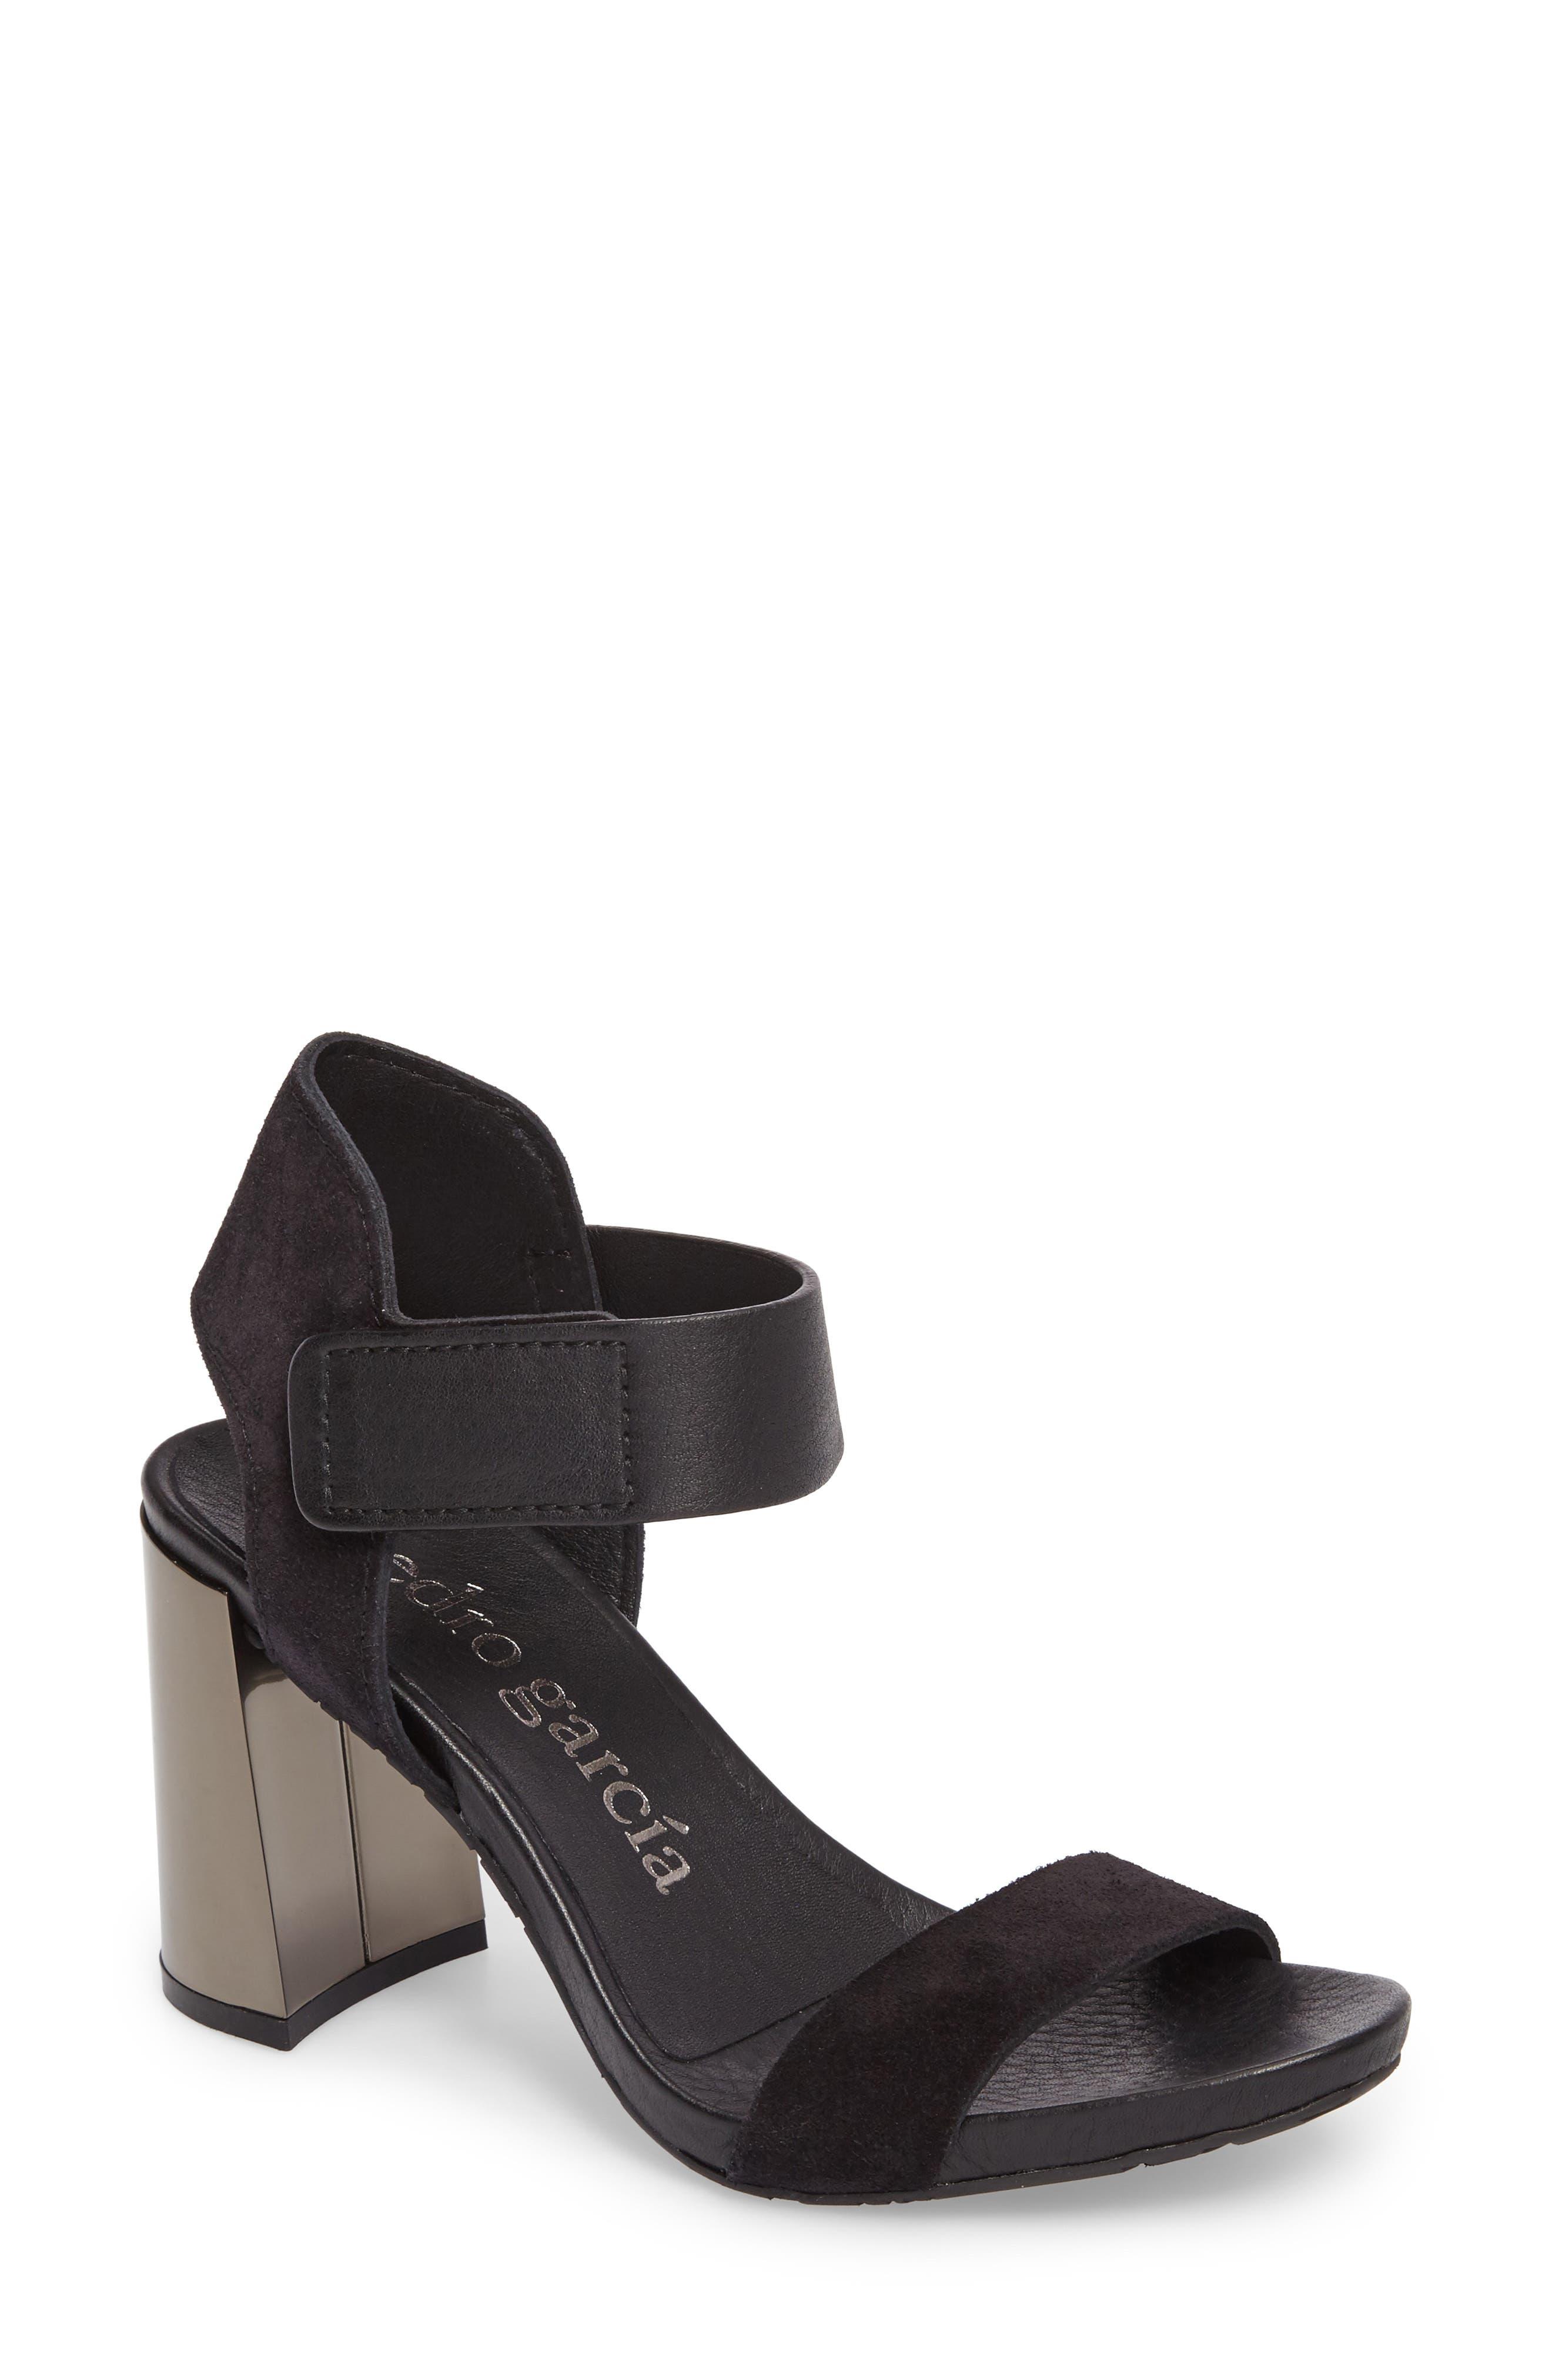 Yenta Sandal,                         Main,                         color, BLACK CASTORO